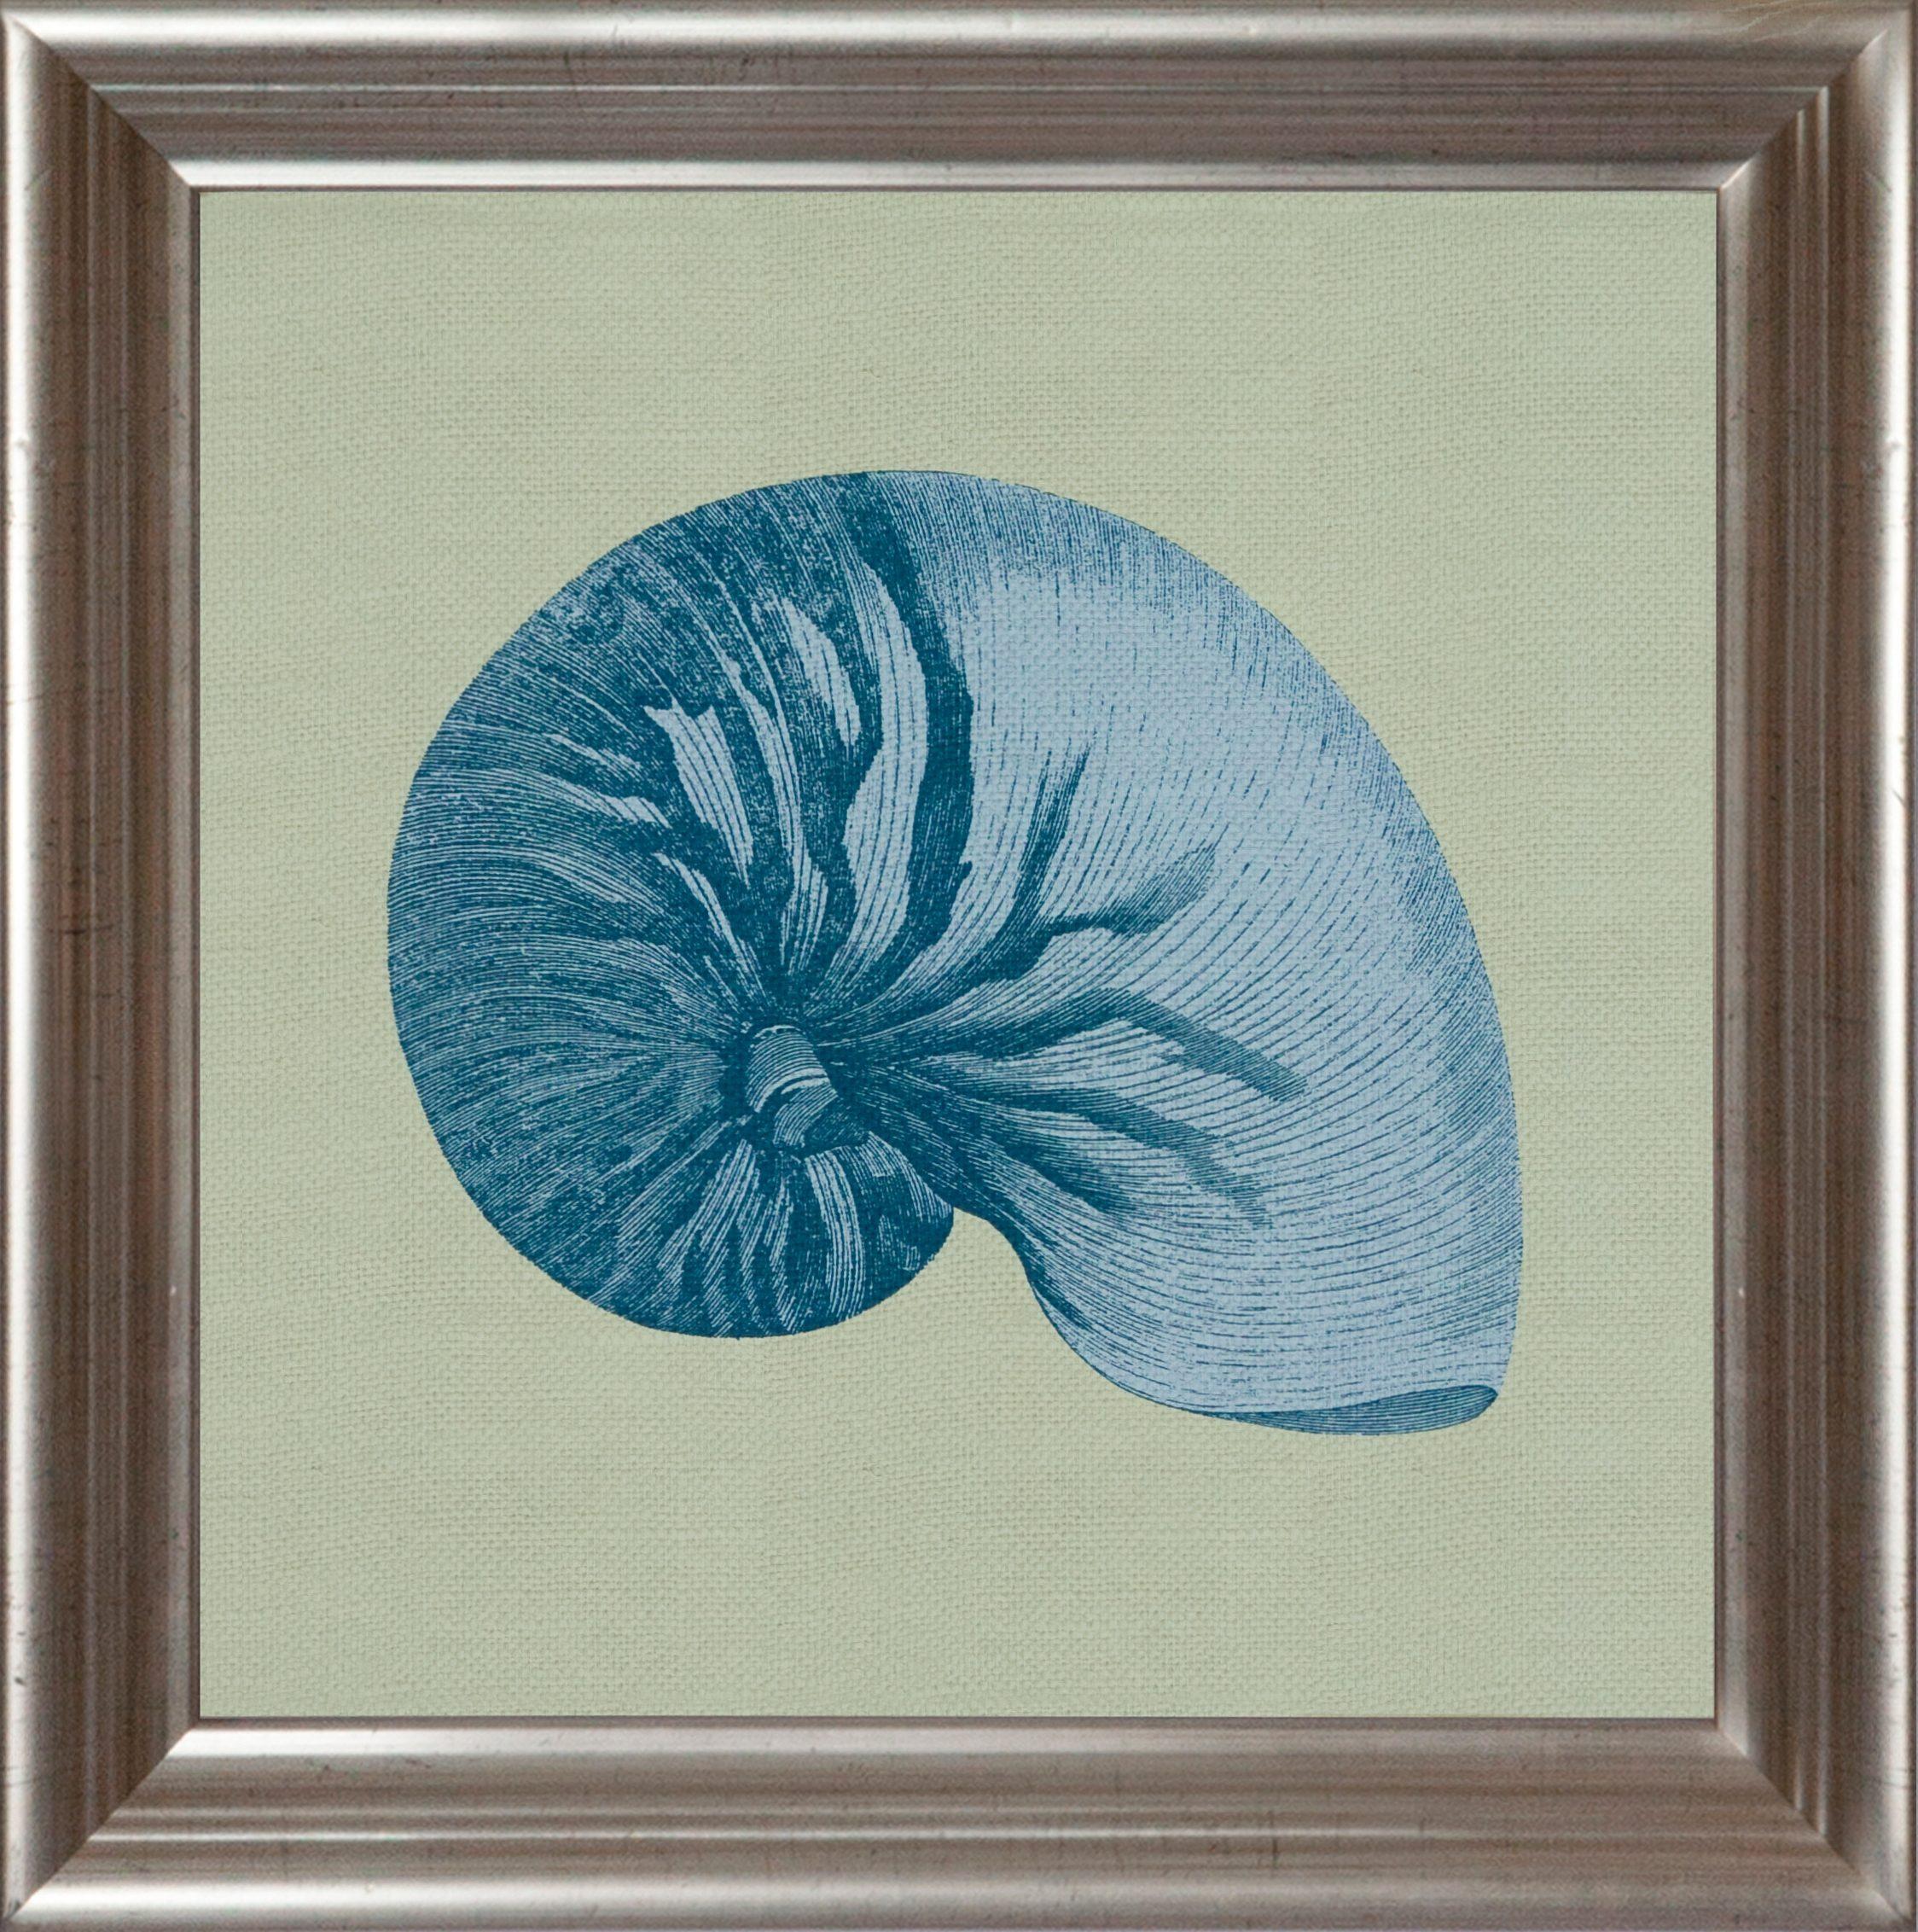 G&C gerahmter Kunstdruck, 40/40 cm